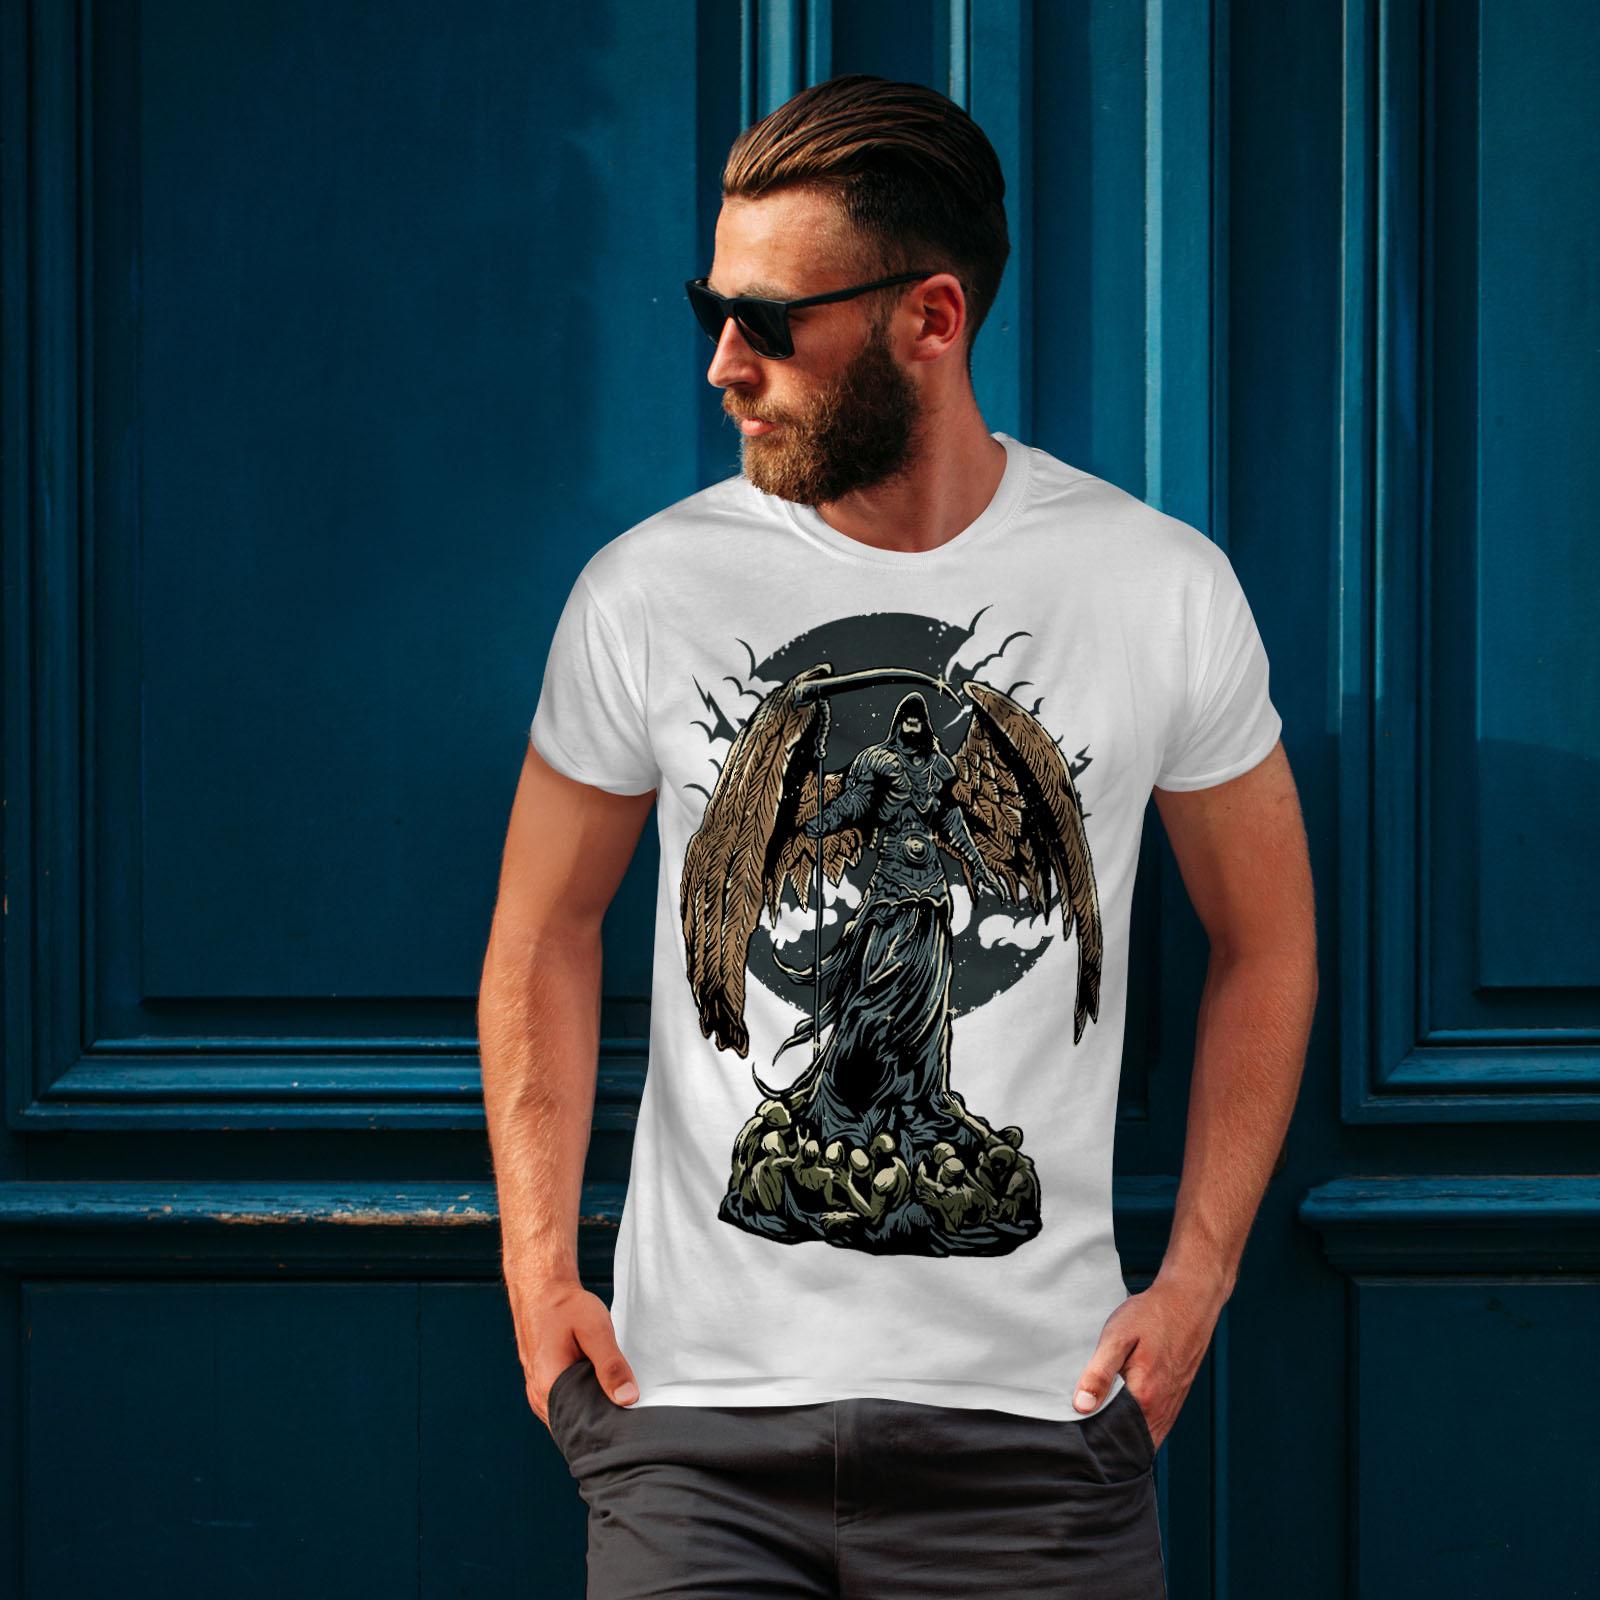 Wellcoda-Evil-Grim-Reaper-Mens-T-shirt-Horror-Graphic-Design-Printed-Tee thumbnail 10